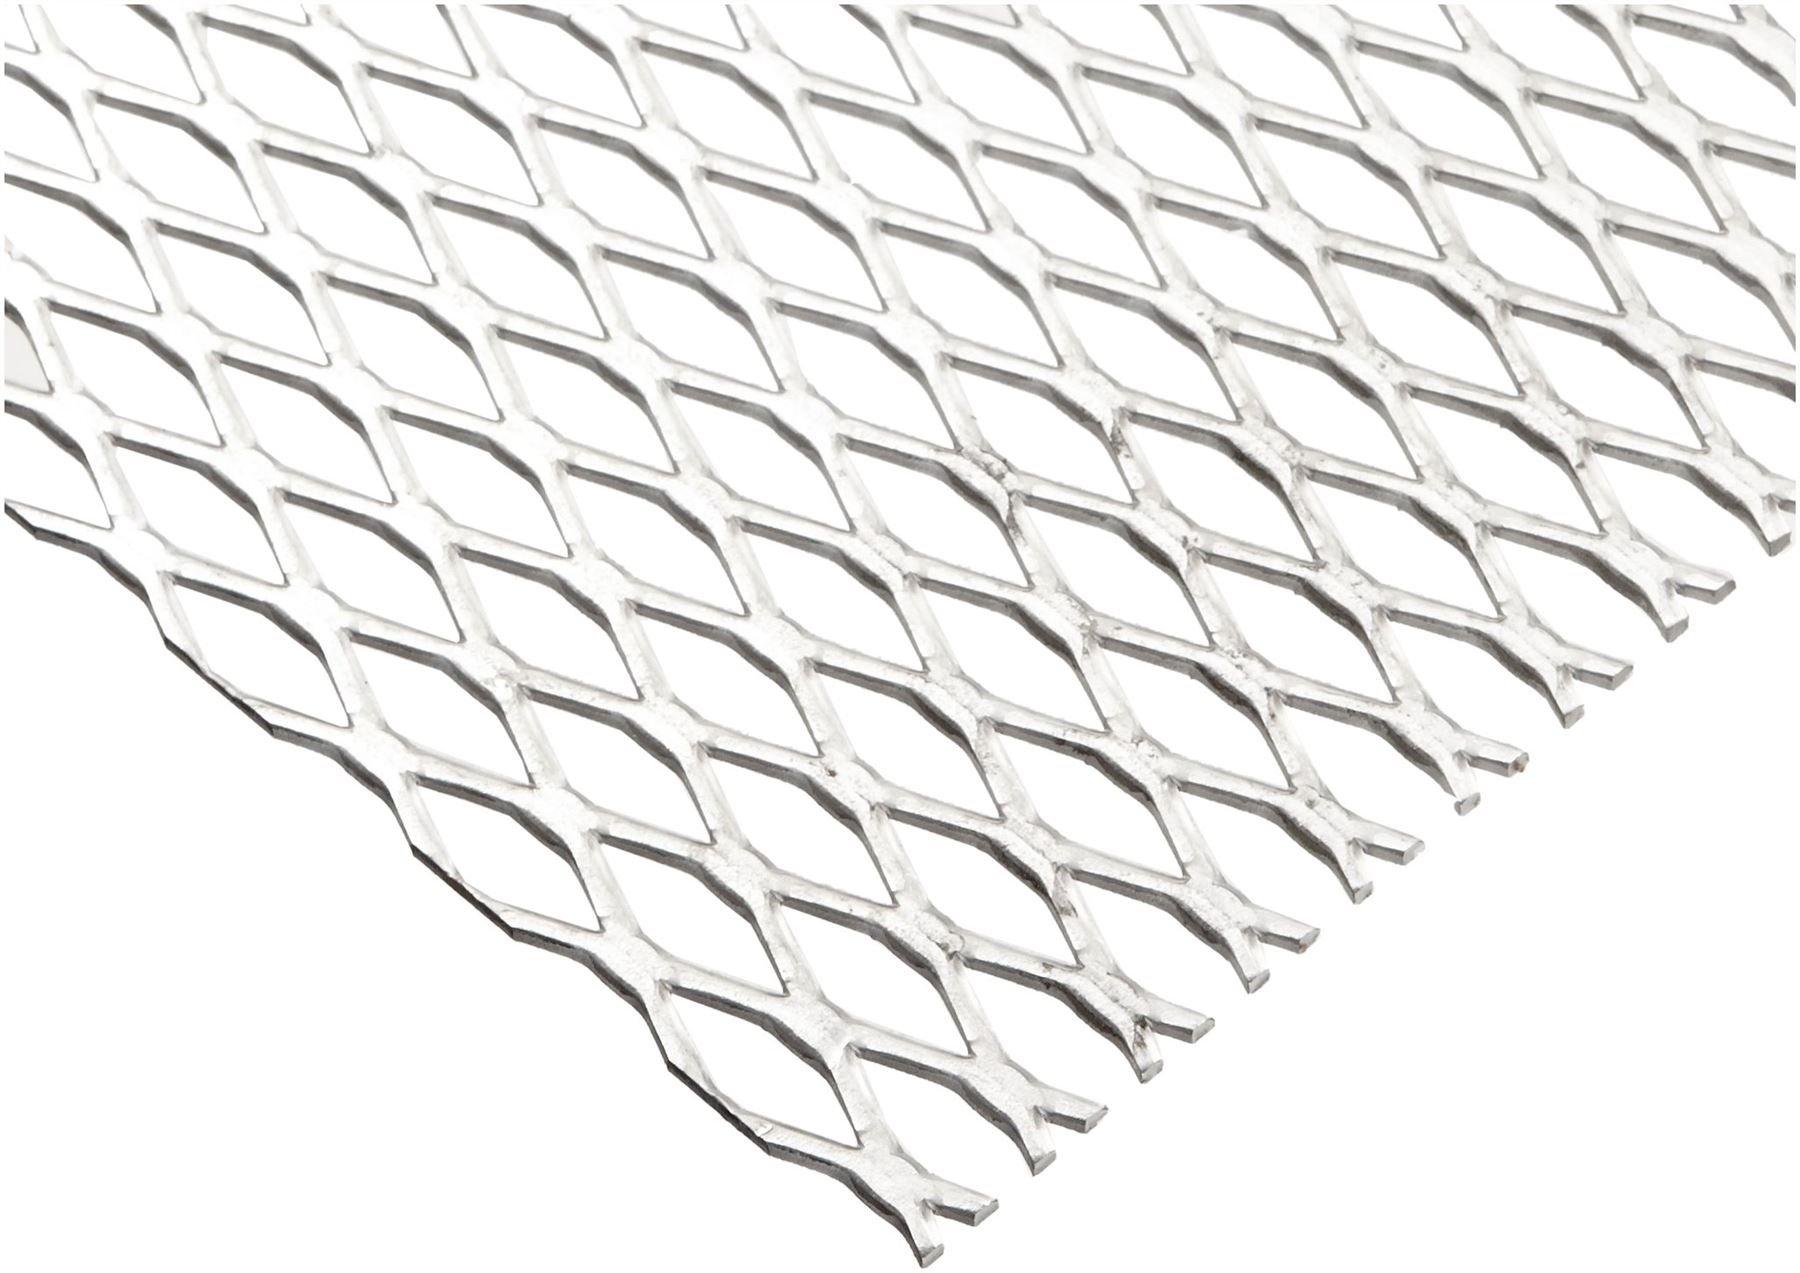 Online Metal Supply Steel Expanded Metal, Galvanized, Flattened Sheet 1/2#16.050'' x 24'' x 24''